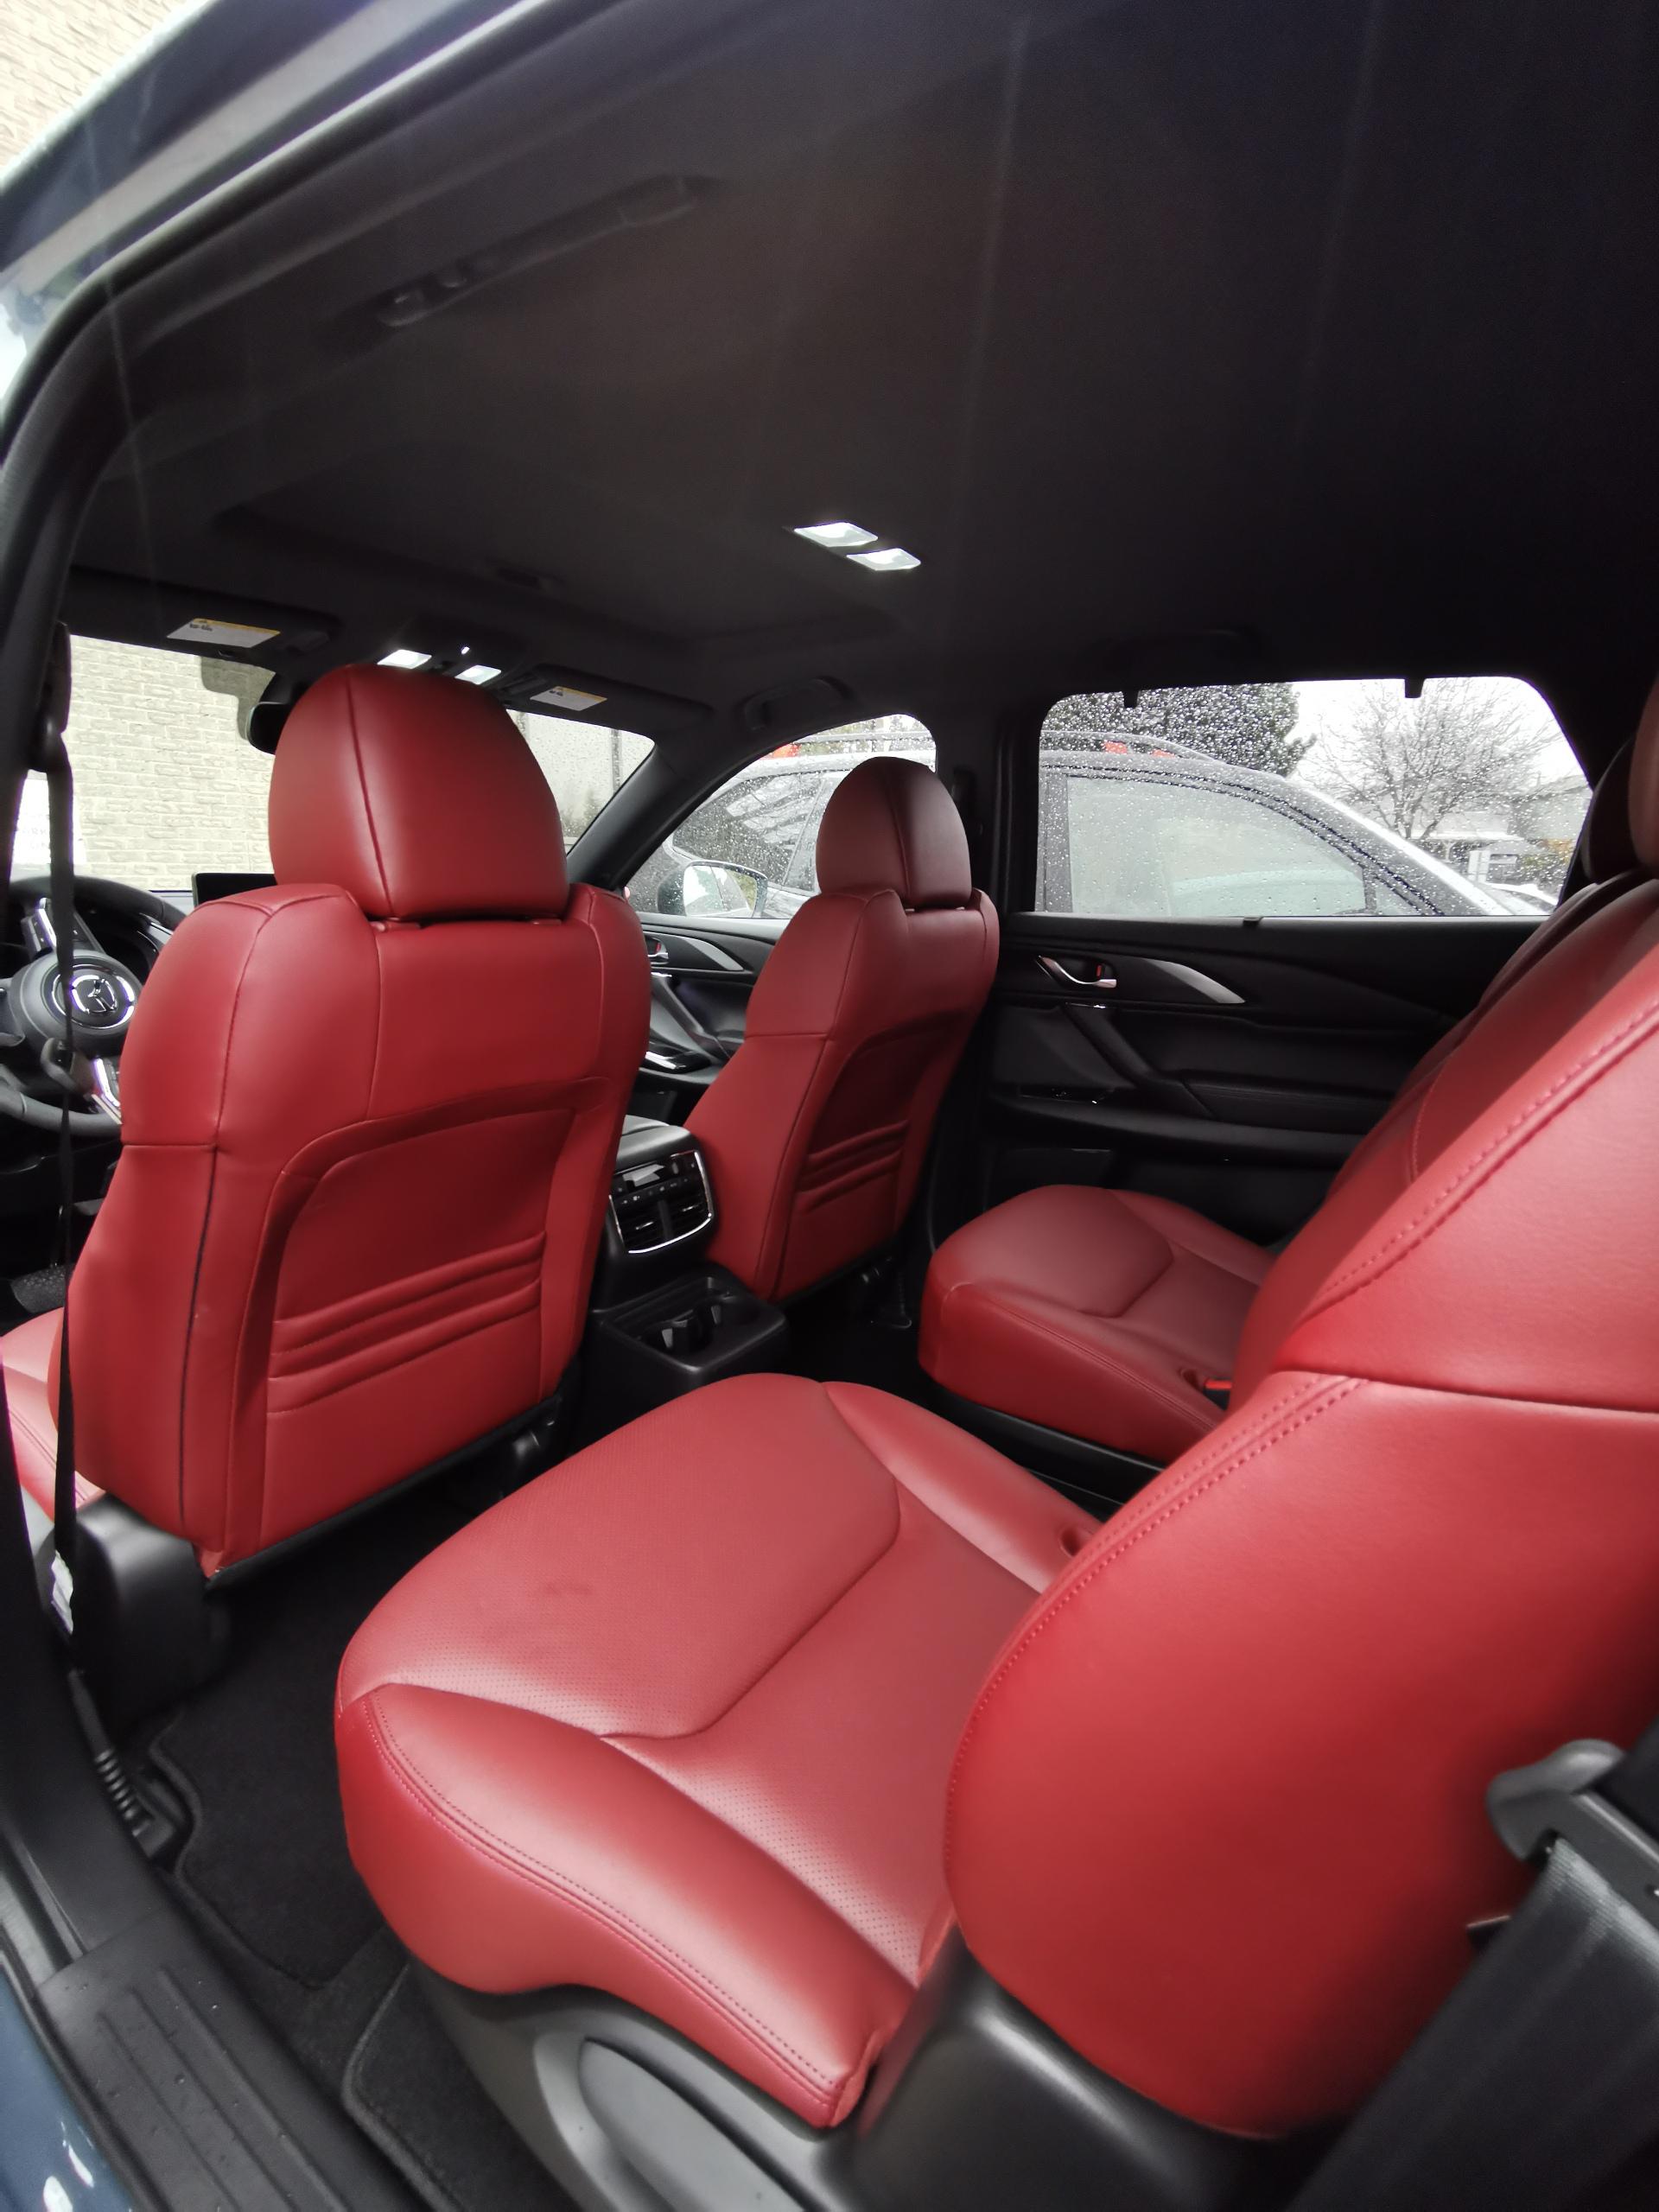 (Inside Look) 2021 Mazda CX-9 Kuro Edition 黒 – SUV AWD